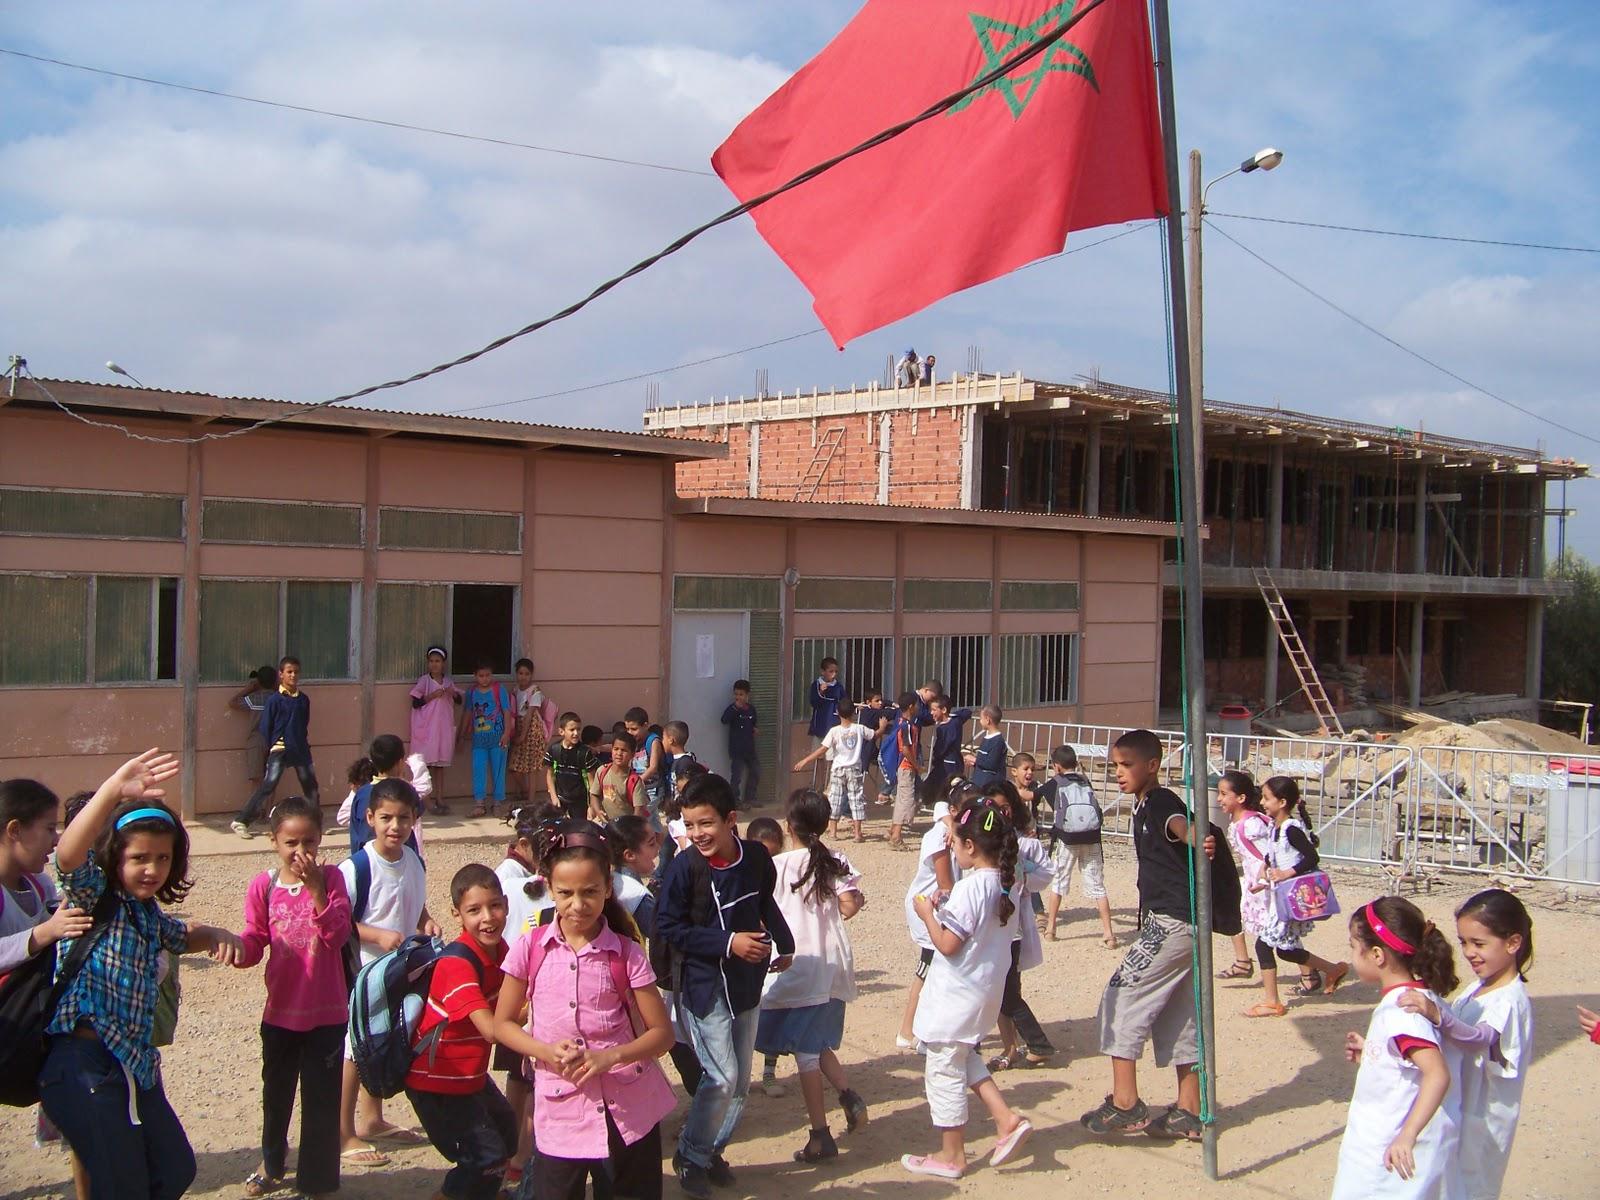 En cooperaci n la situaci n de la educaci n en marruecos for Educacion exterior marruecos